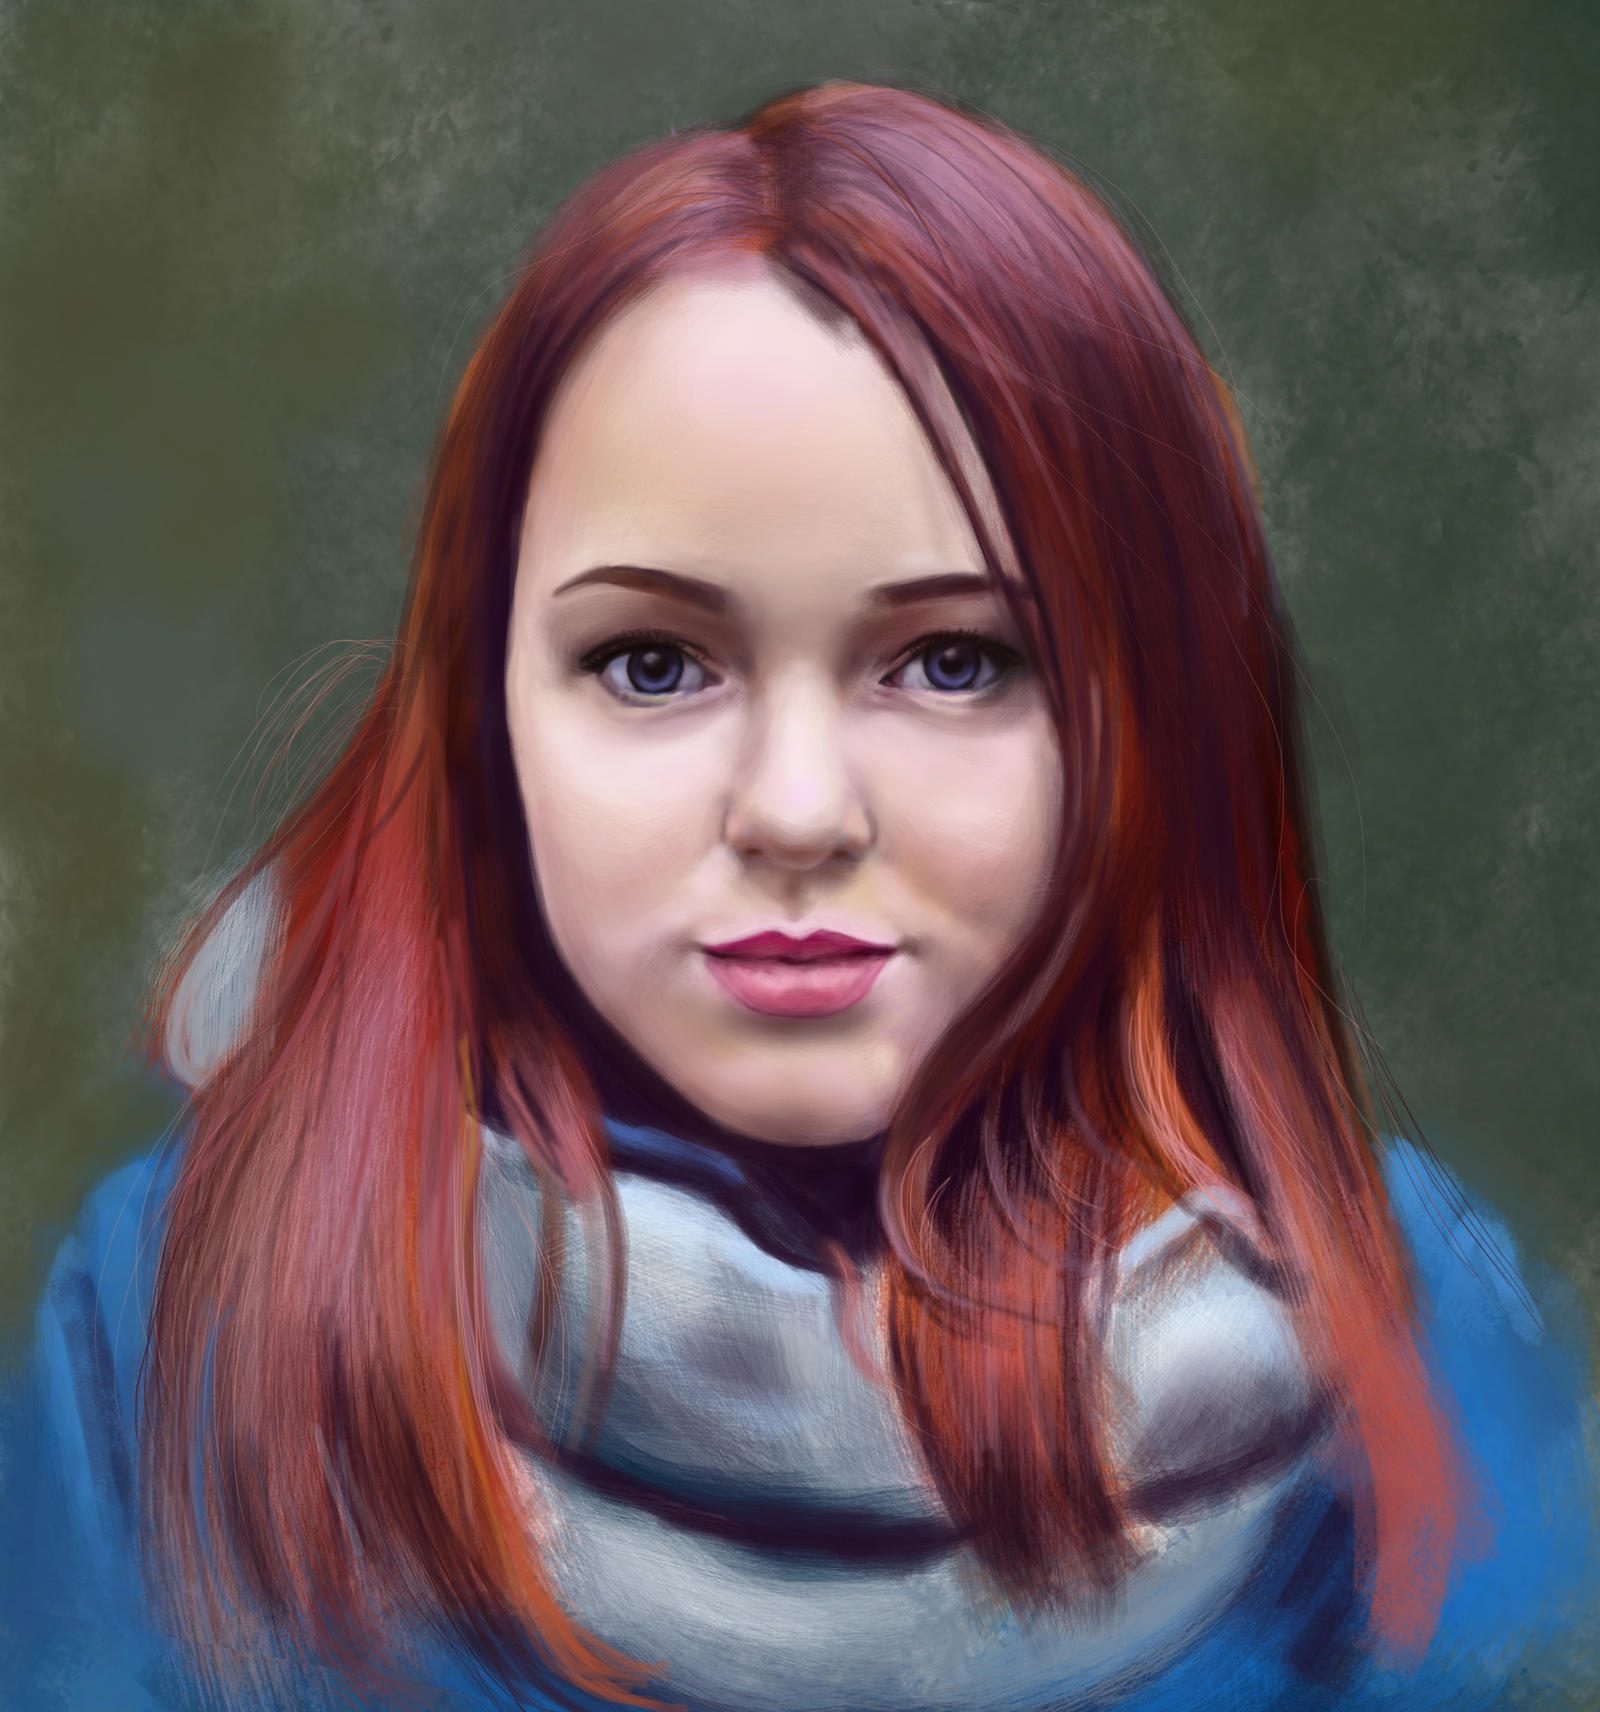 girls portrait. Study by Nelsonito